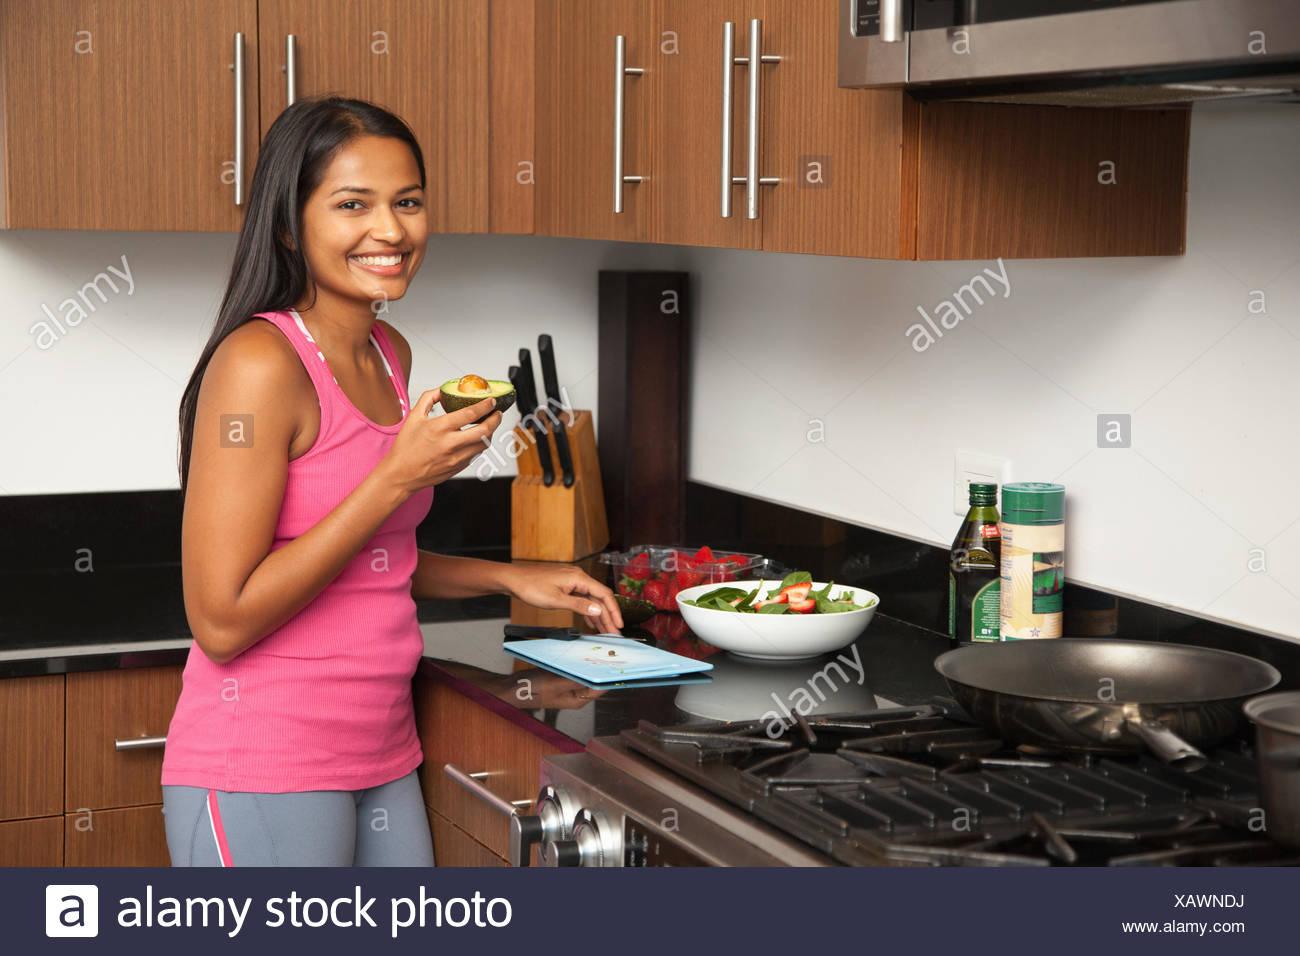 Frau bereitet Salat in Küche Stockbild